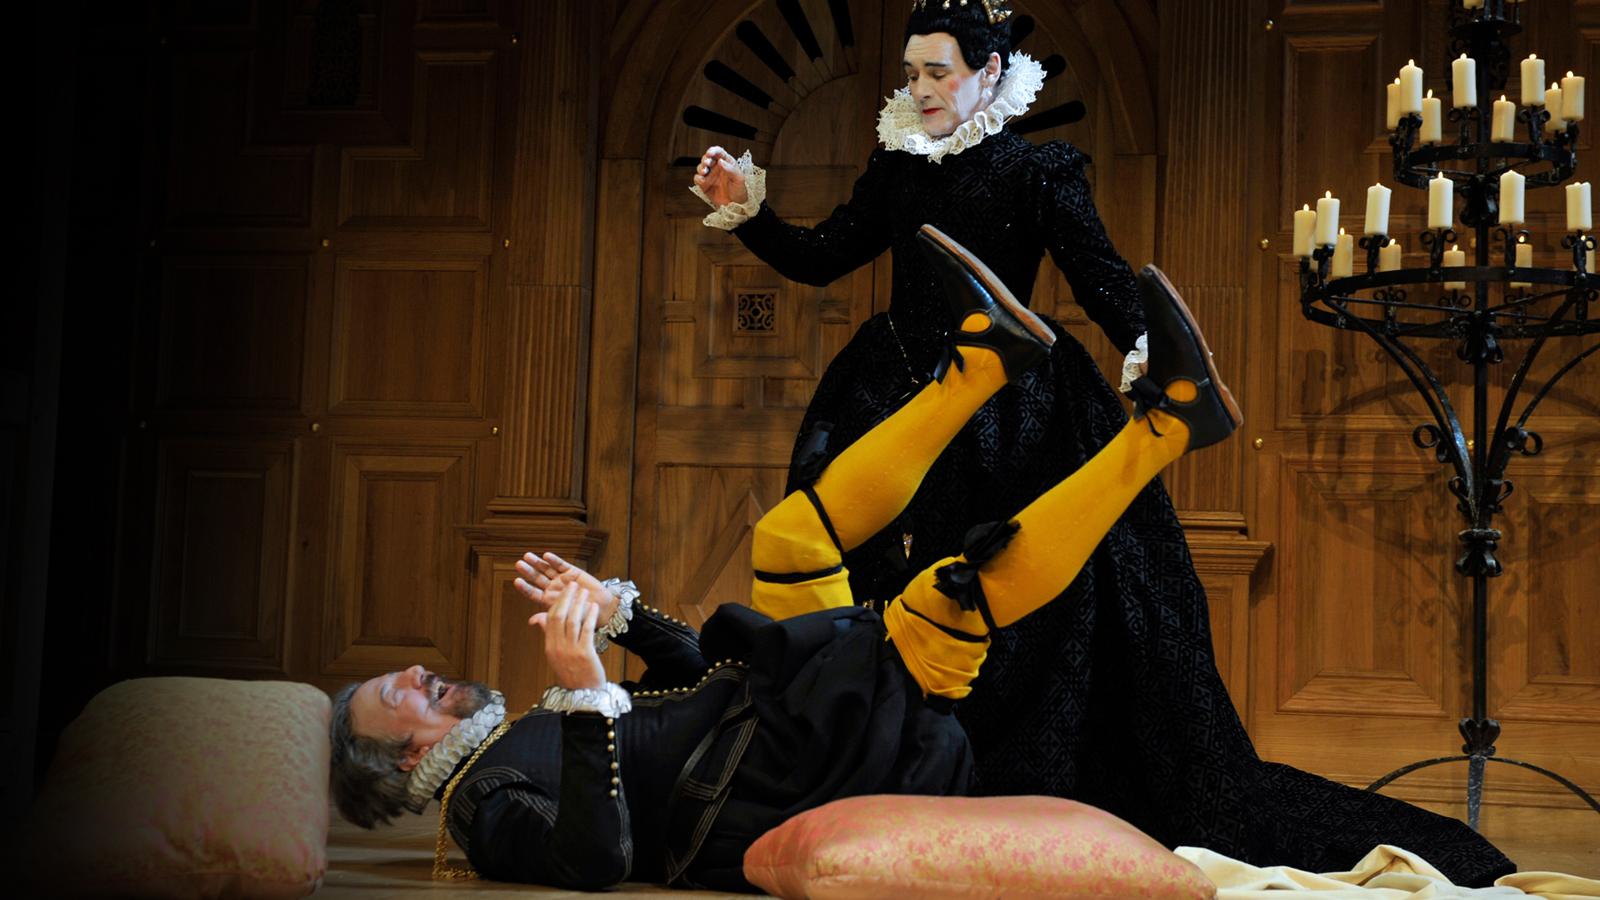 Twelfth Night and festive comedy